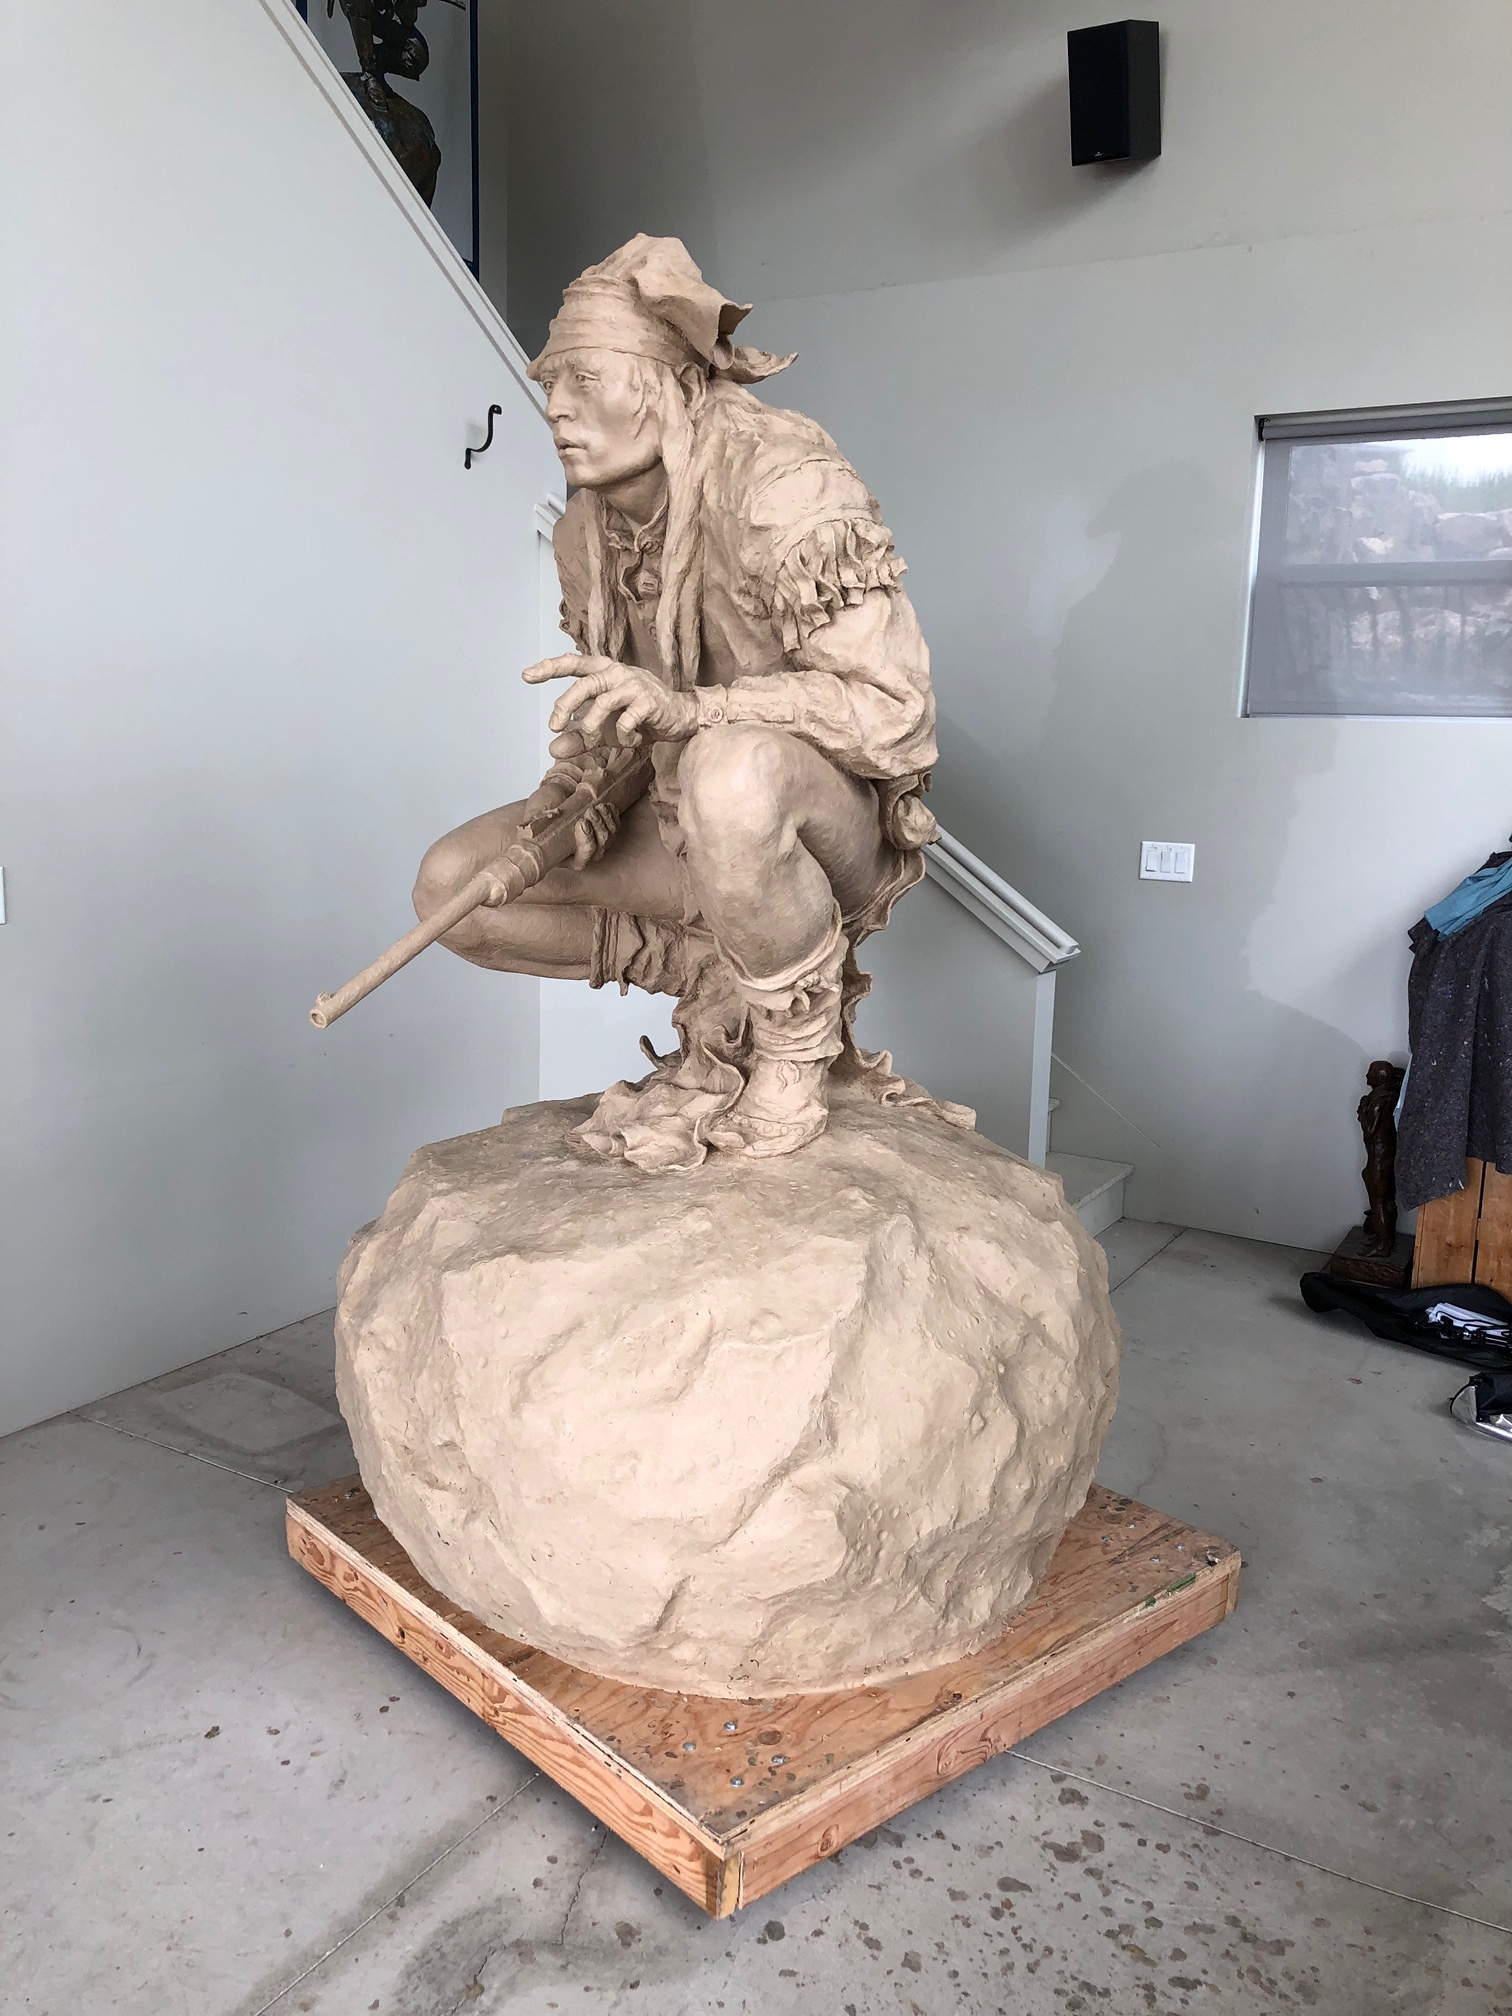 "Chiricahua Apache (Monument) by Scott Rogers | Precast Clay for Bronze | 6'11"" x 4'2"" x 4'2"" | $54,000"